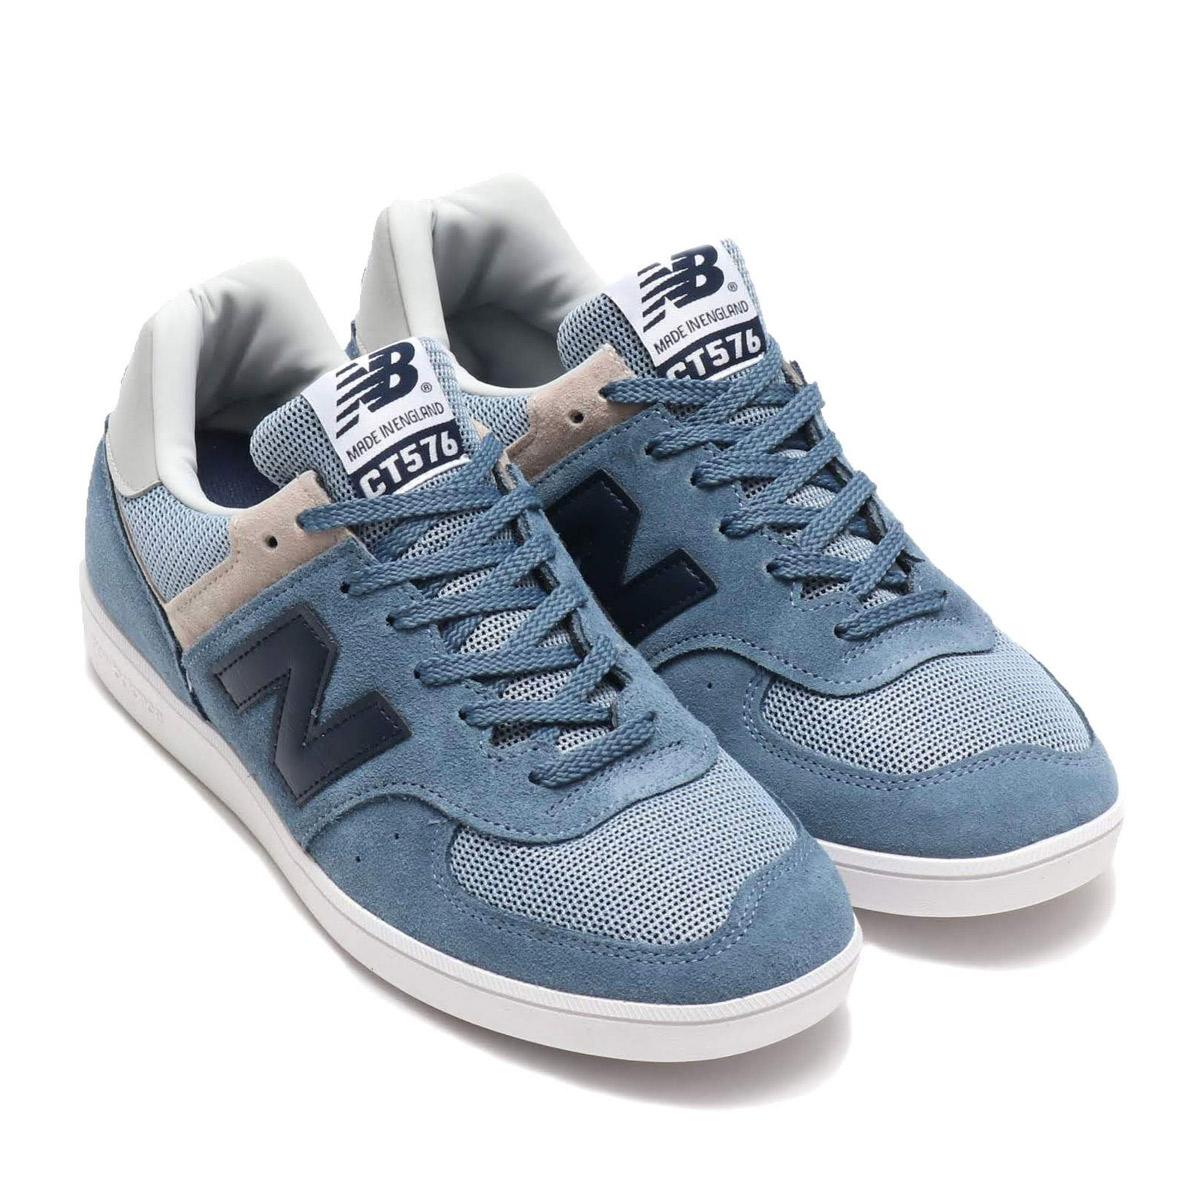 promo code a1a67 ff402 New Balance CT576DBB (New Balance CT576DBB) BLUE 18LS-I